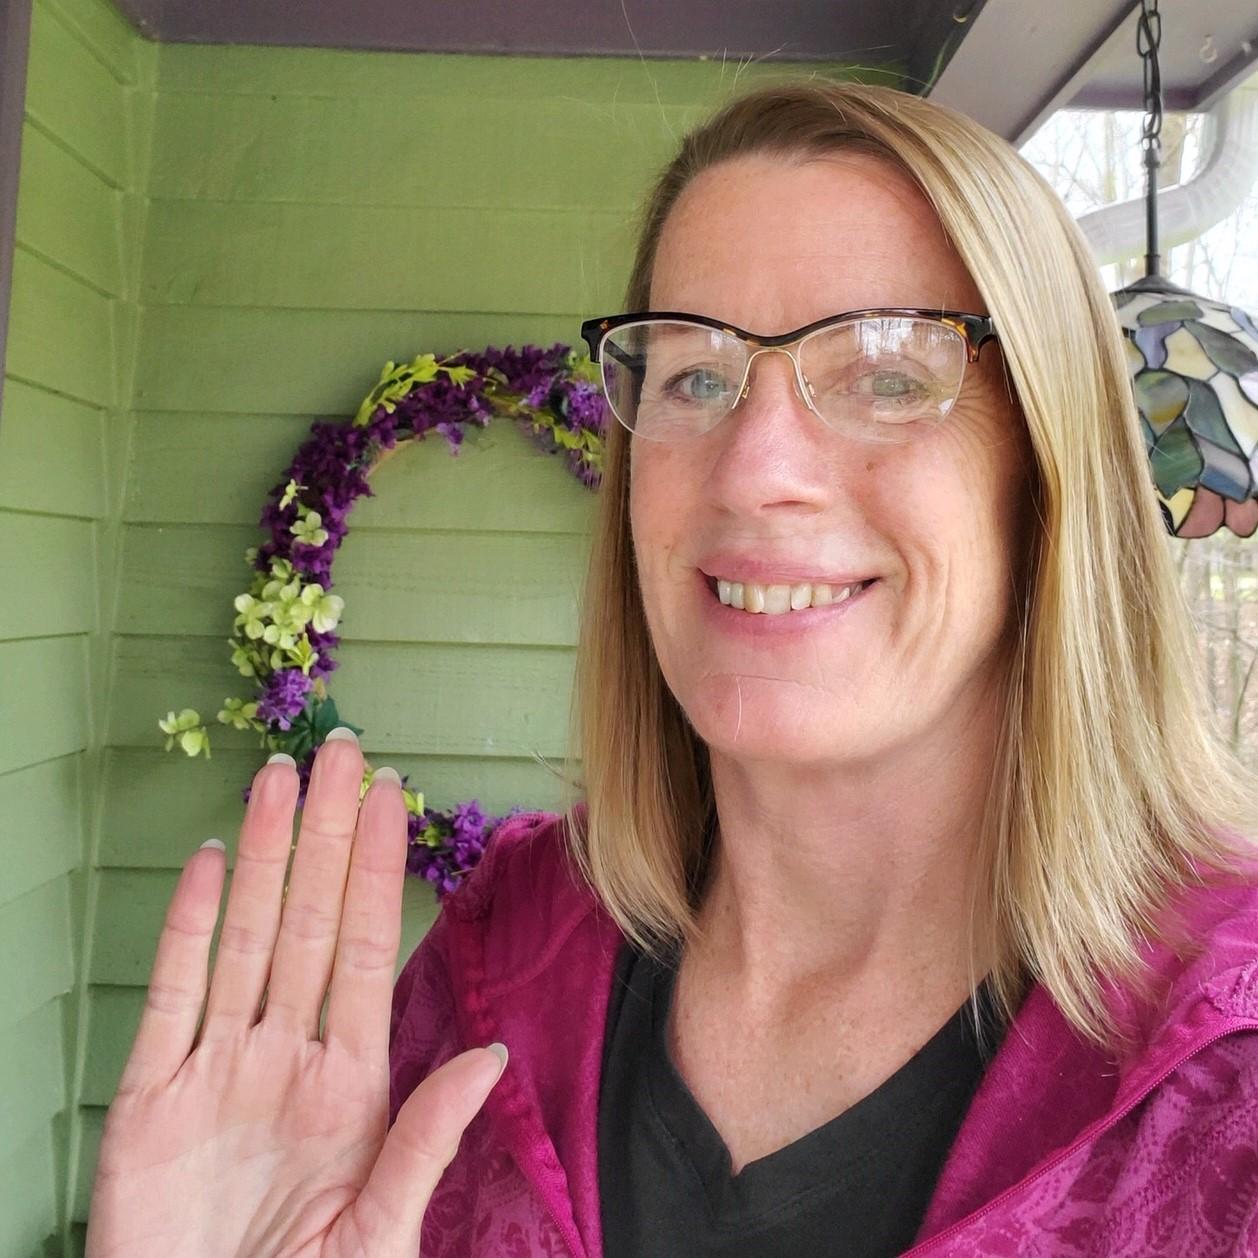 Kathy waving